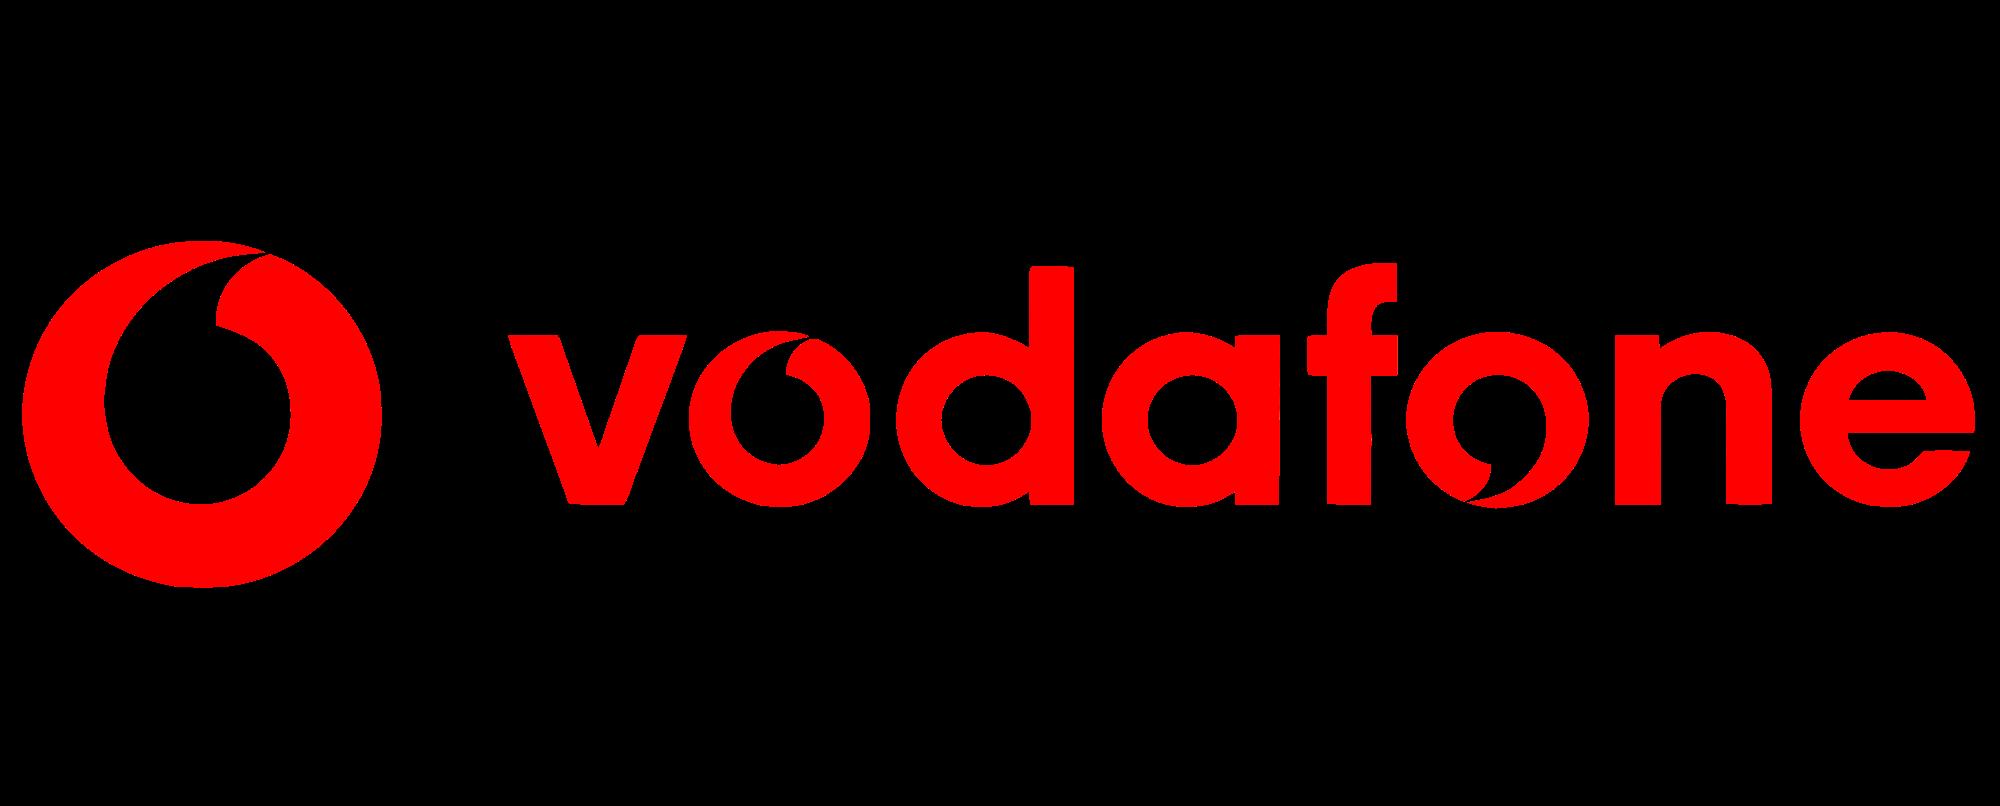 vodafone-png-file-vodafone-2003-2007-png-2000.png